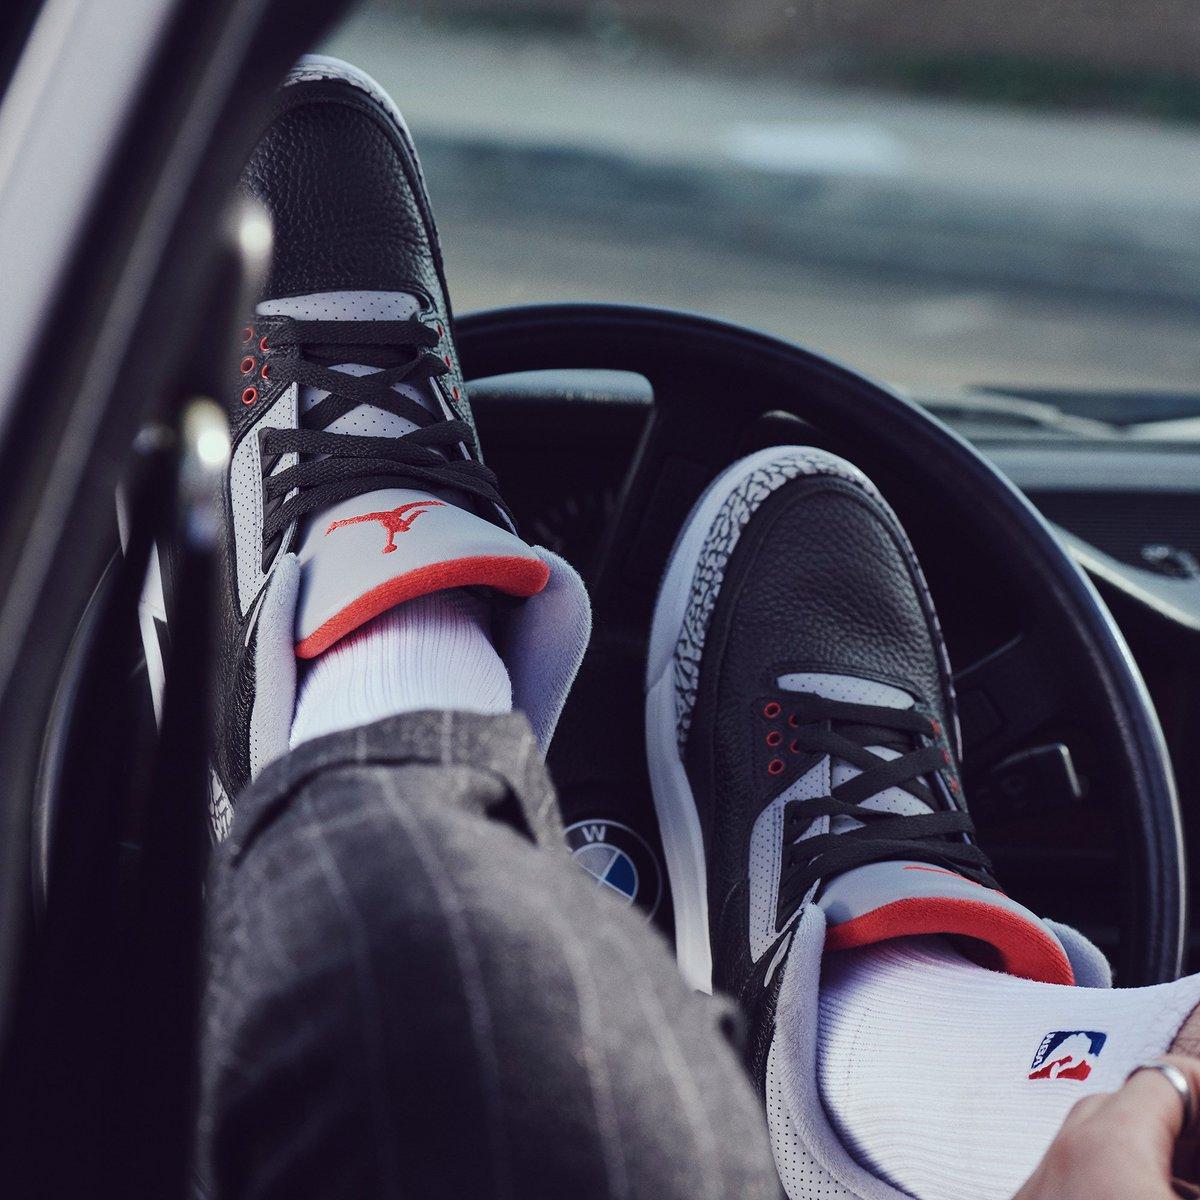 ca1e02c0fa7373 The Air Jordan 3 Retro